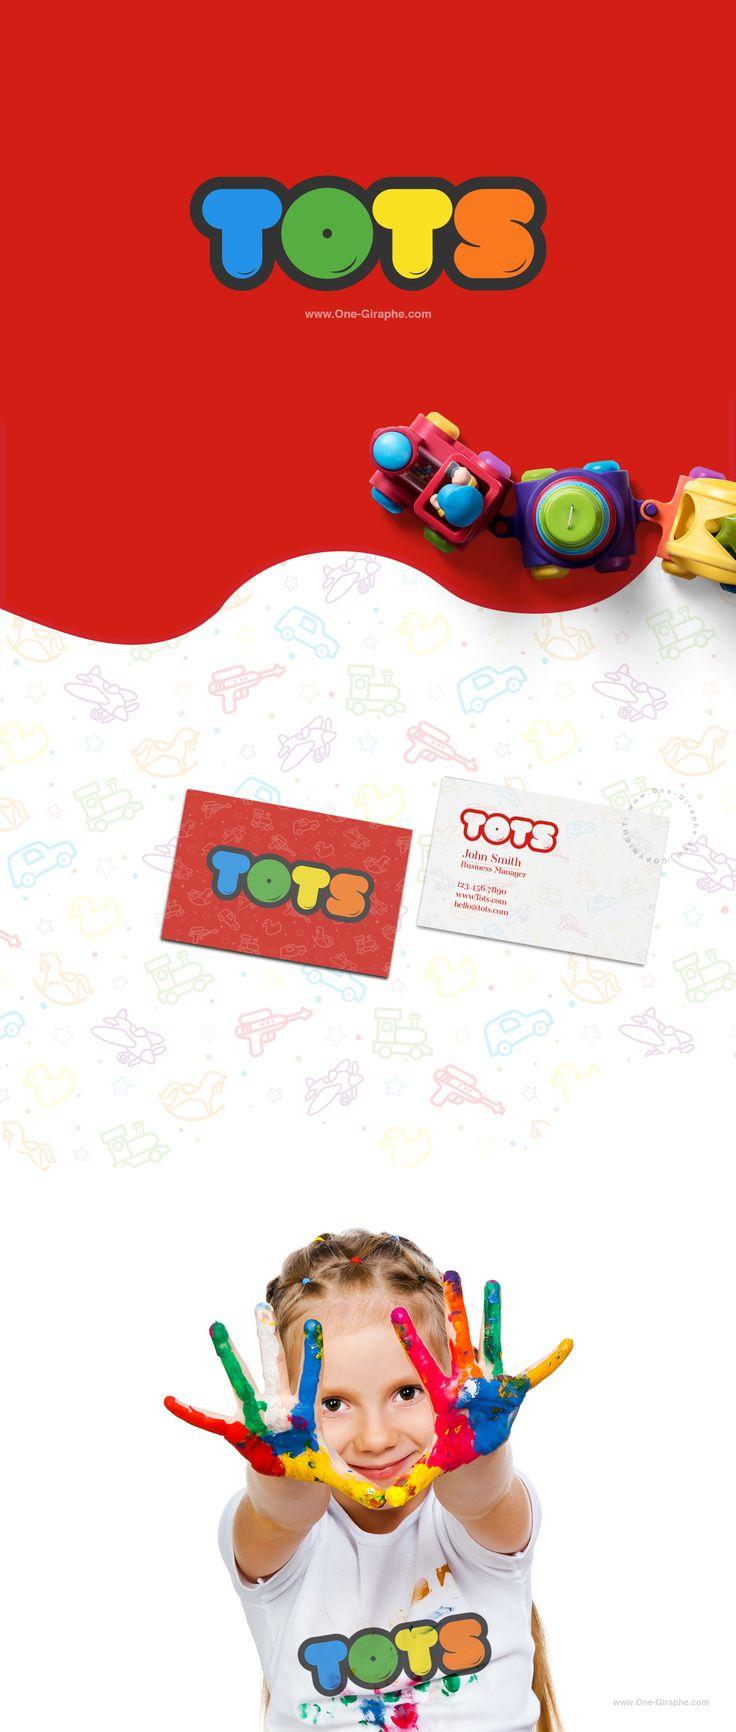 Customize your logo, buy it here:  http://one-giraphe.com/prev.php?c=234   #baby #logo #logodesign #cute #sleep #sleepy #graphic #design #designer #portfolio #behance #logopond #bird #store #kids  #logodesign #design #designer #toys